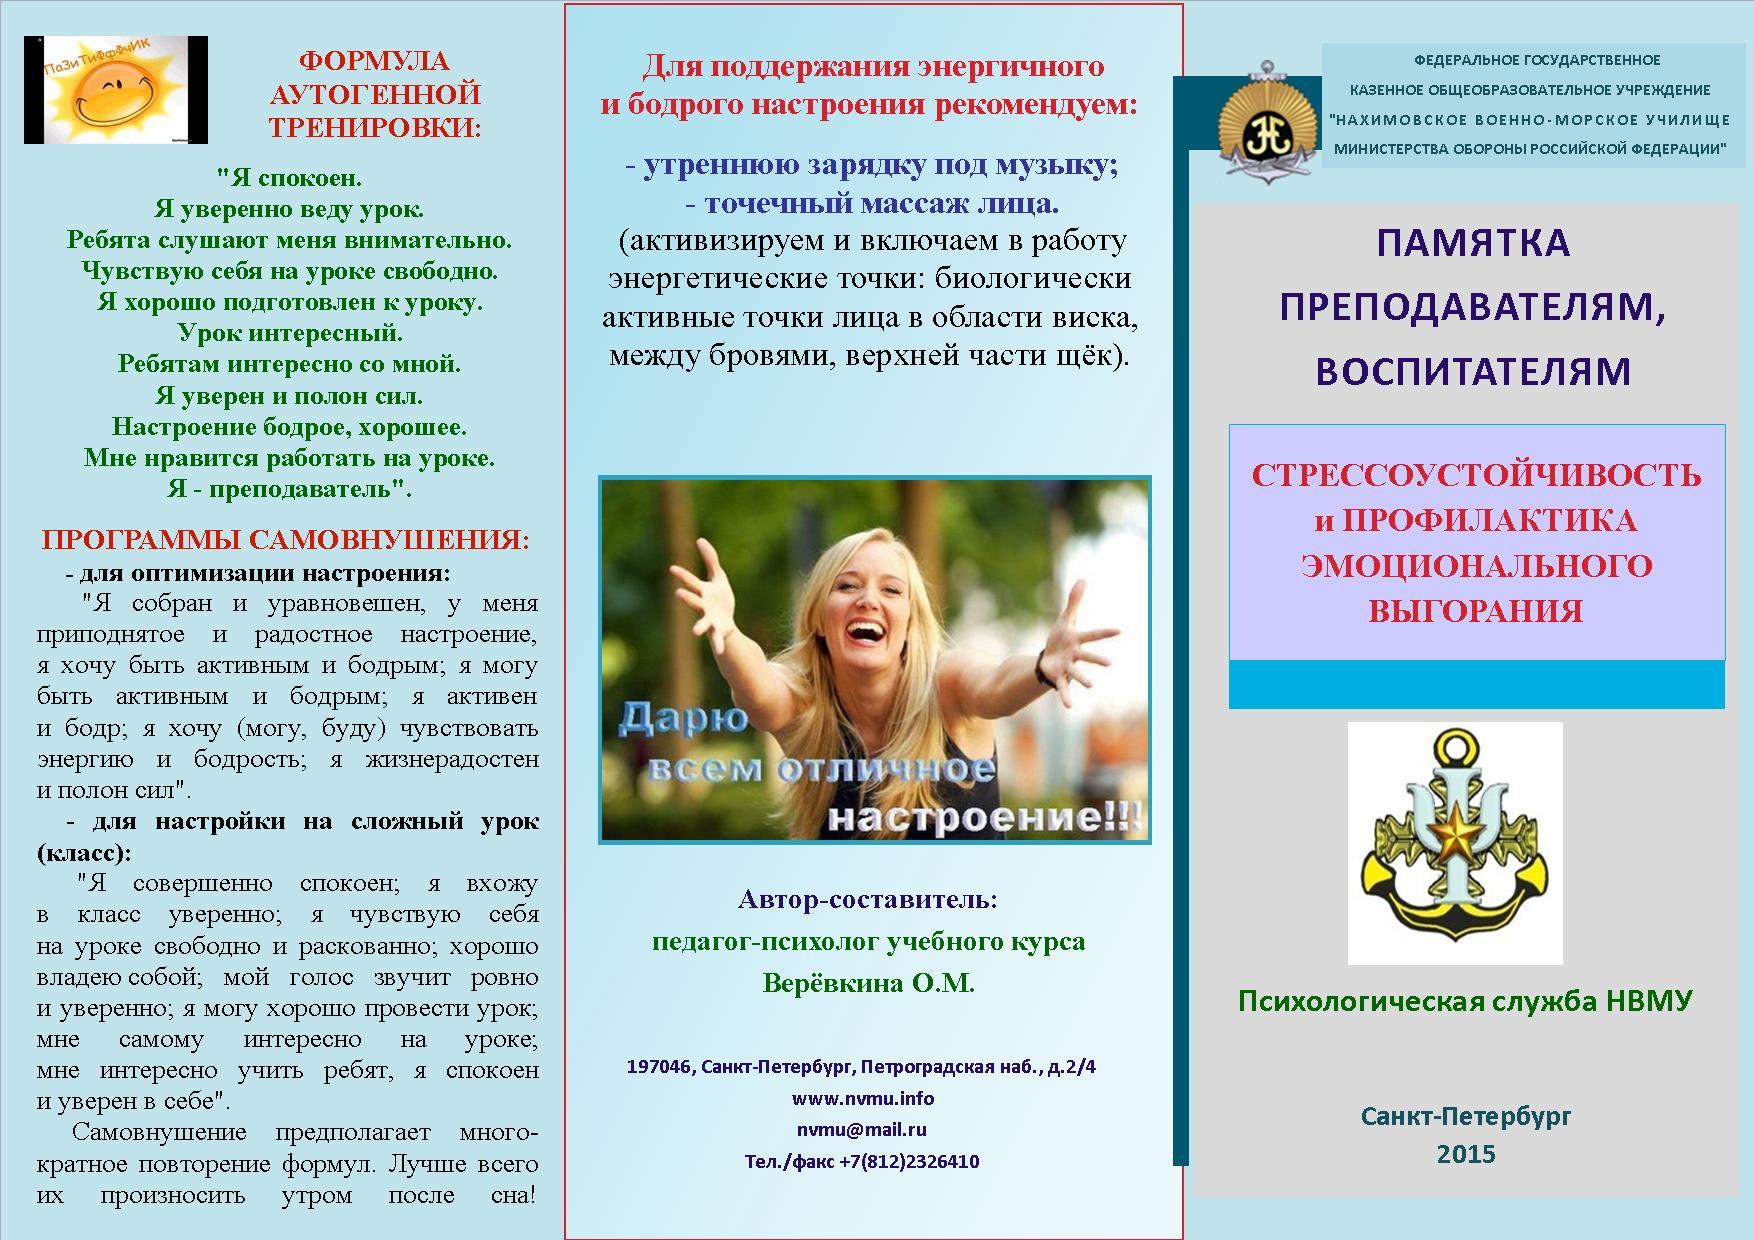 картинки для брошюры психолога хочу поделиться